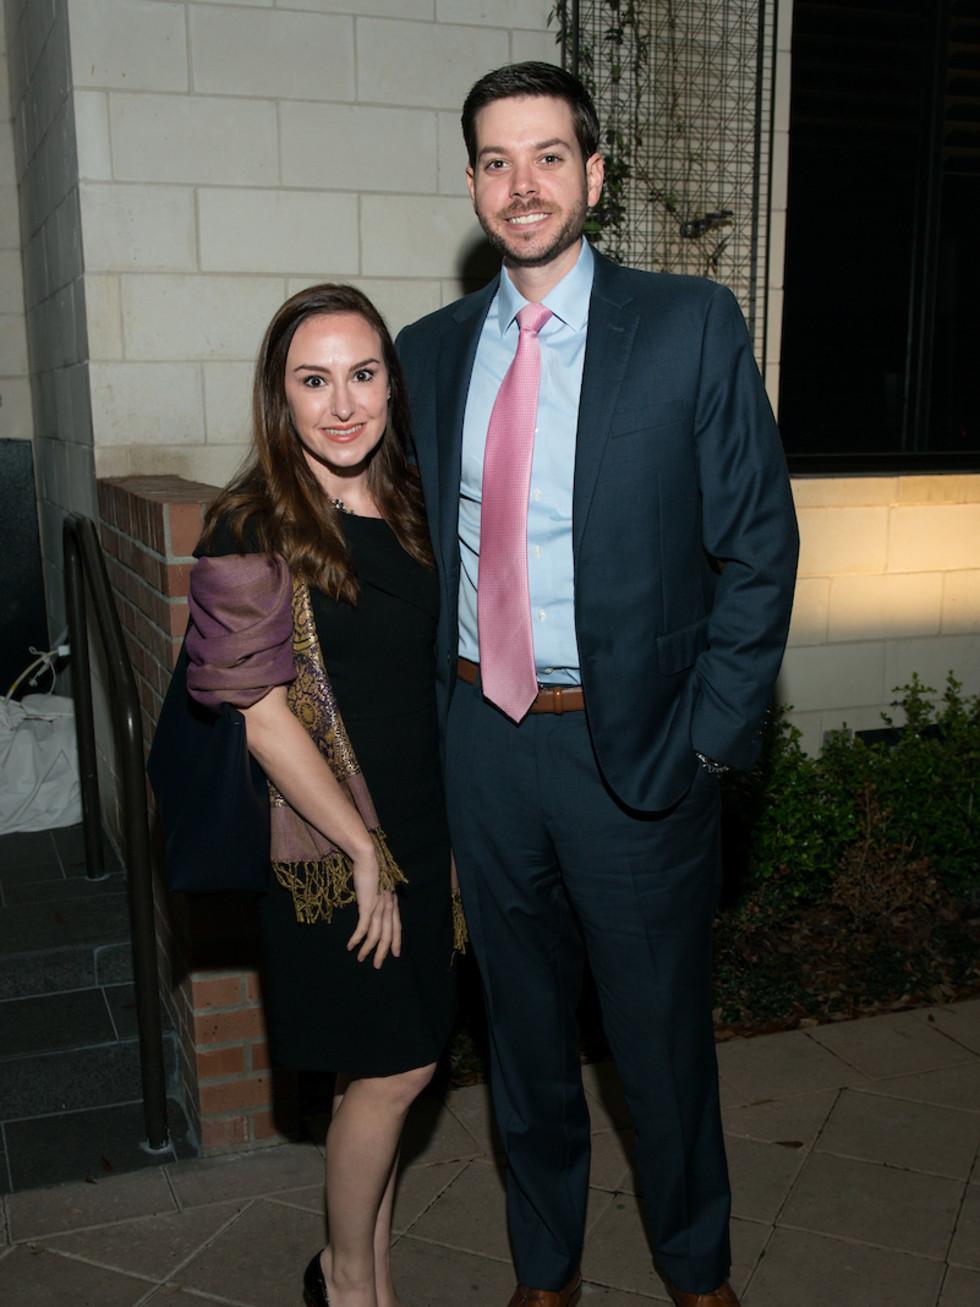 Beth Brown and Matt Elwell